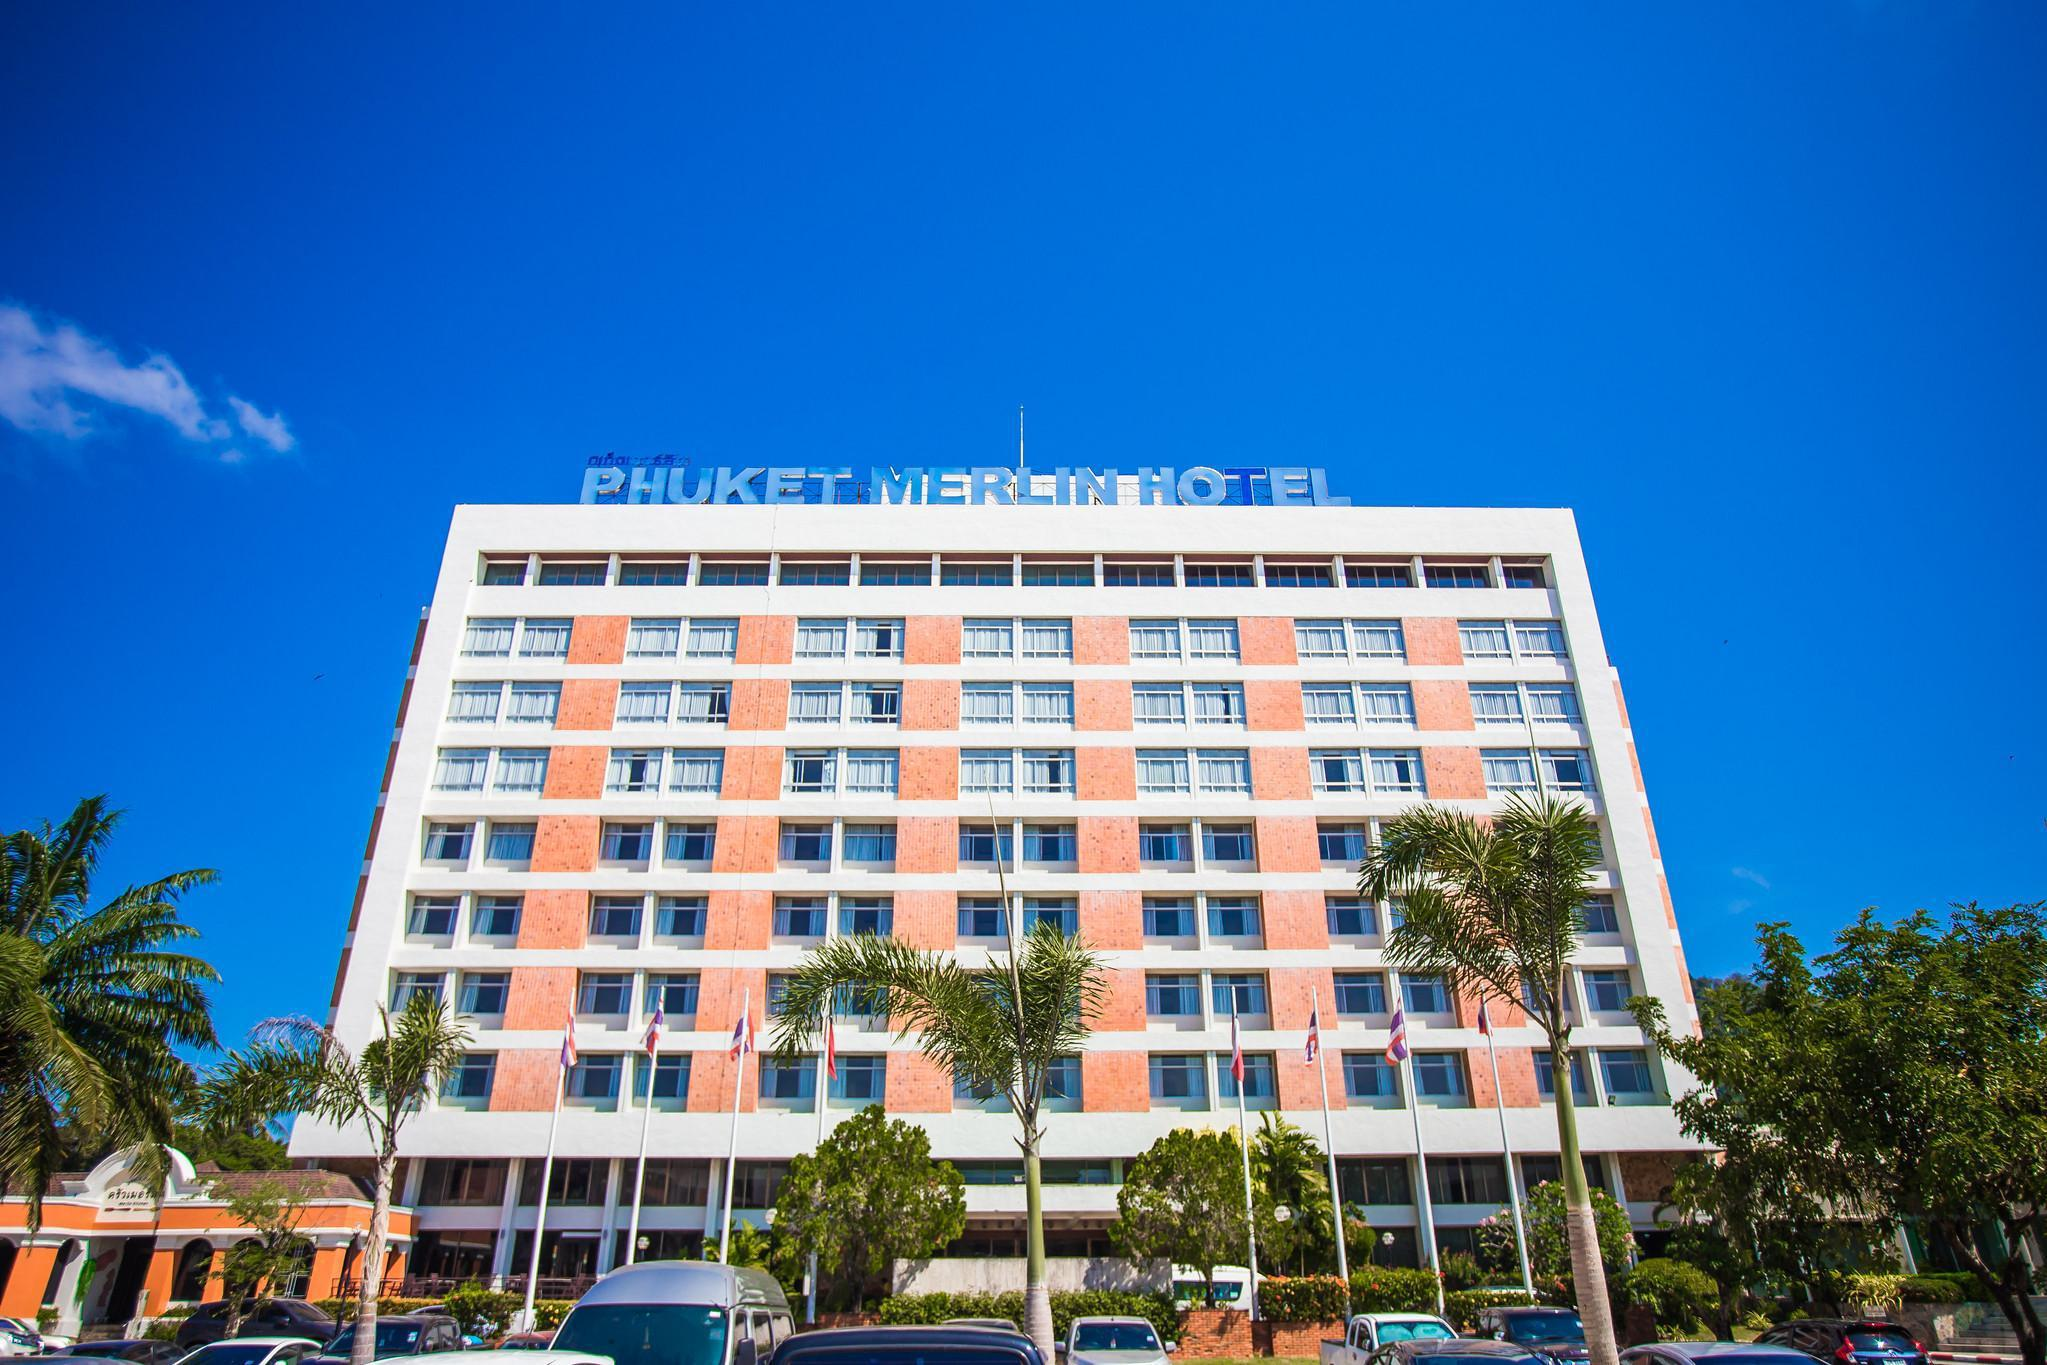 Phuket Merlin Hotel โรงแรมภูเก็ต เมอร์ลิน